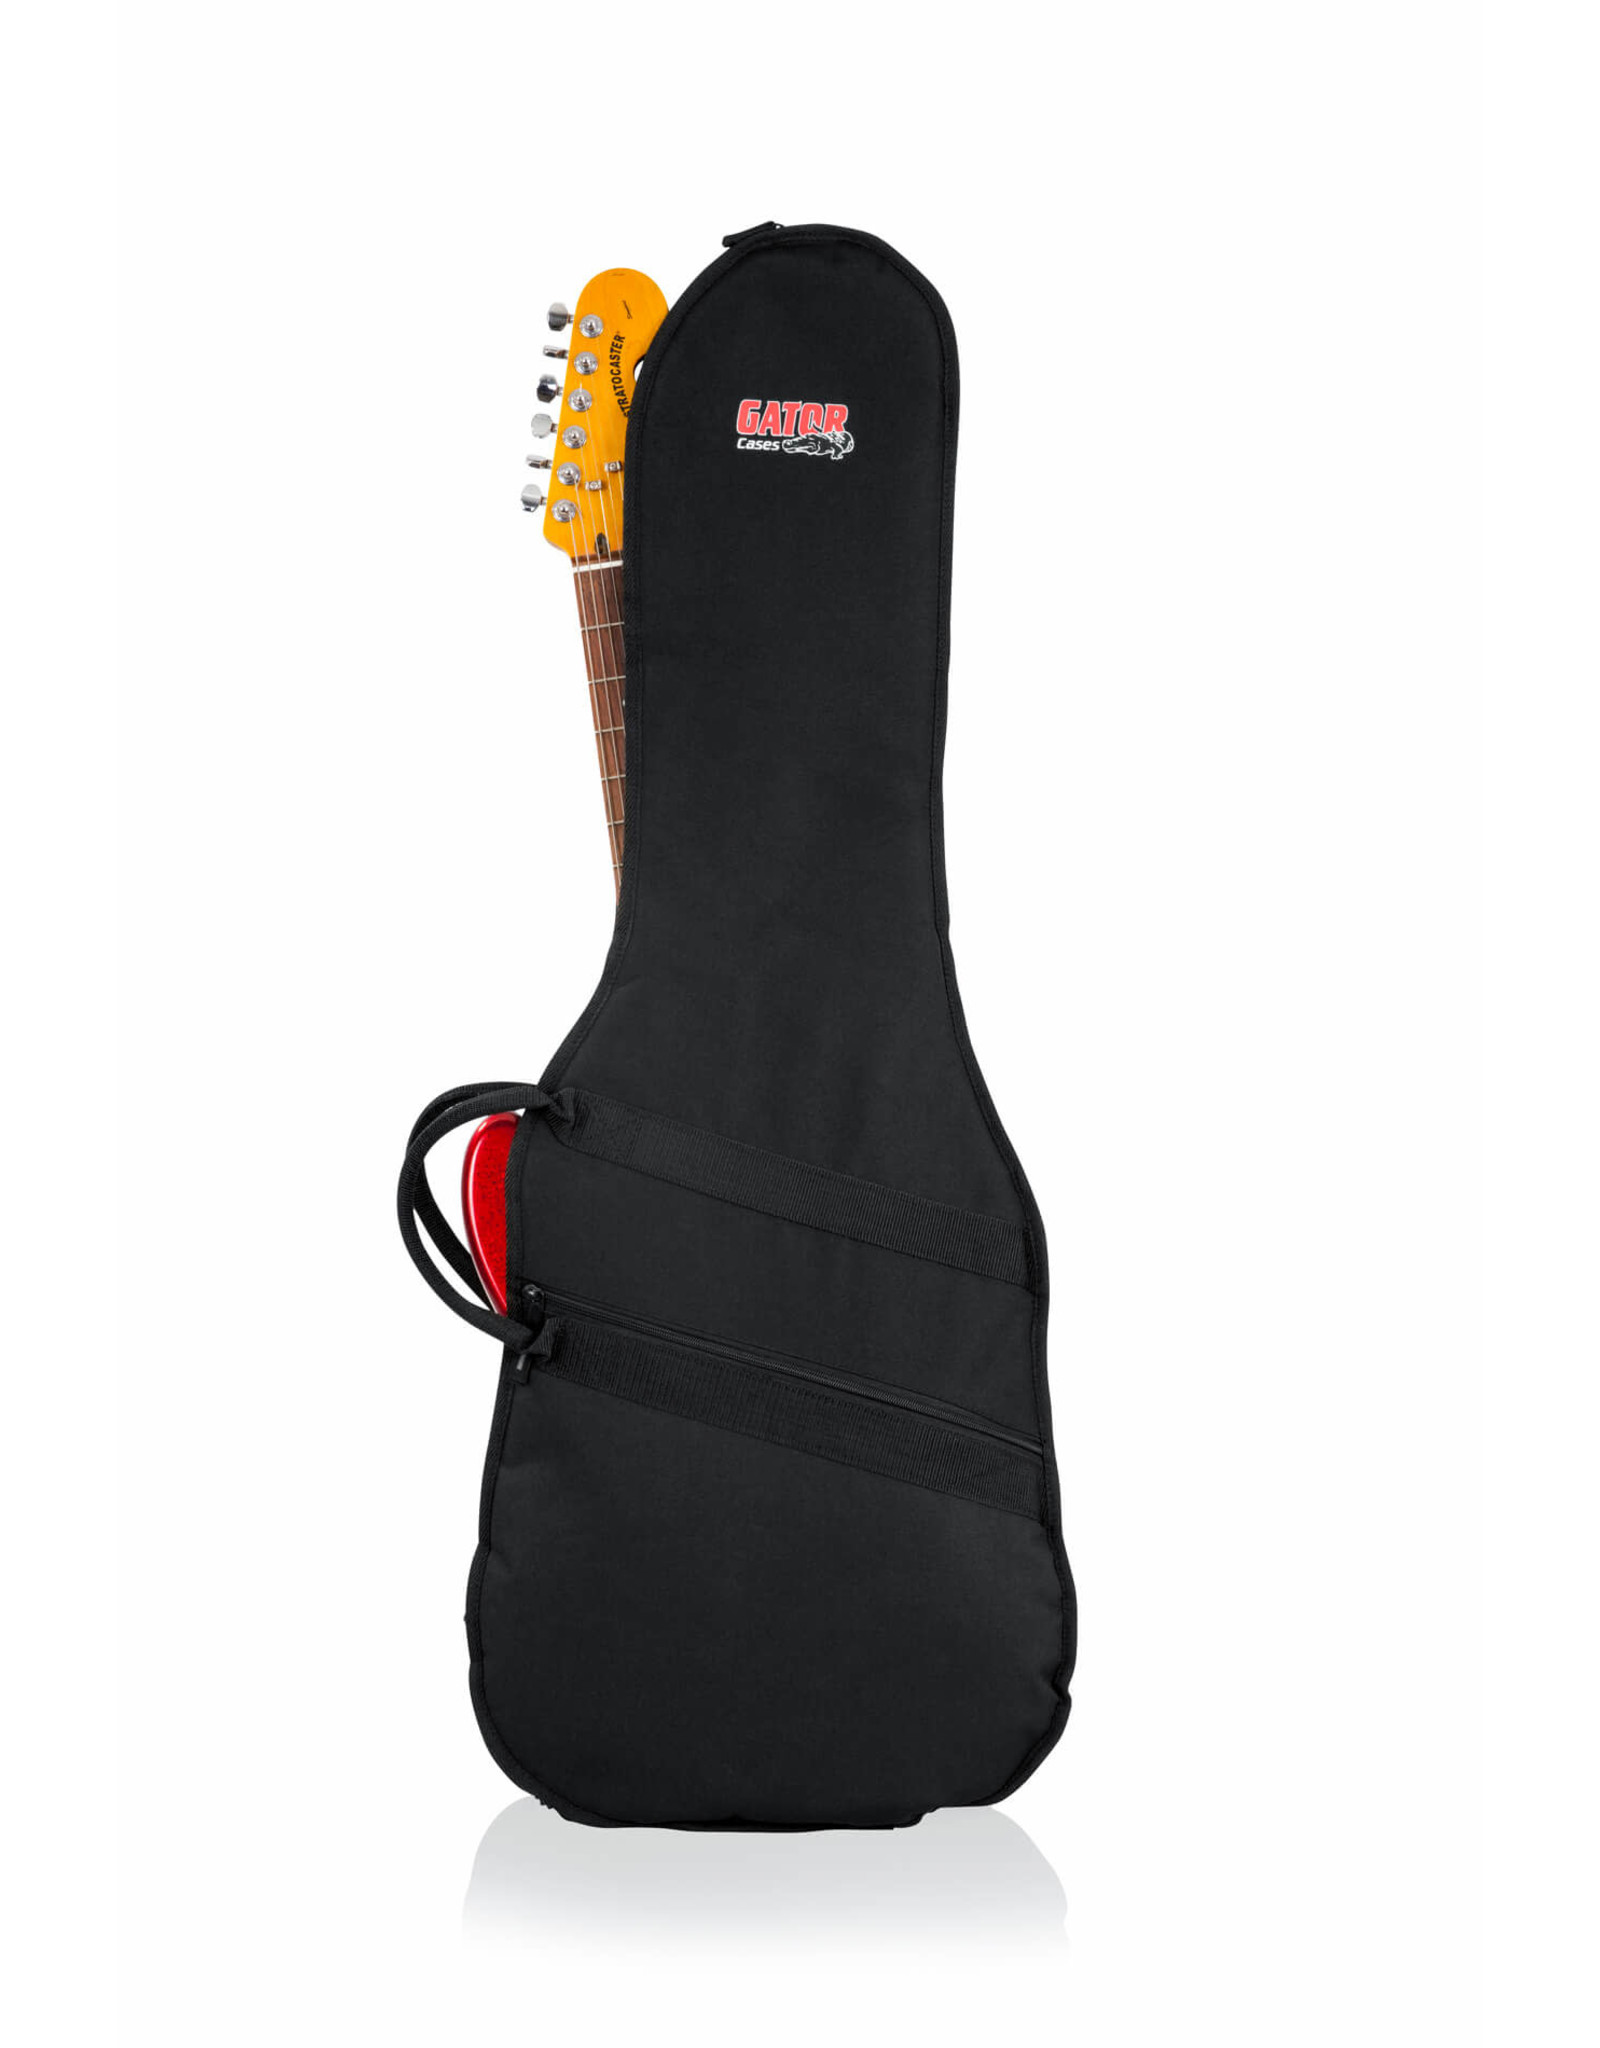 Gator Gator GBE Series Electric Guitar Gig Bag